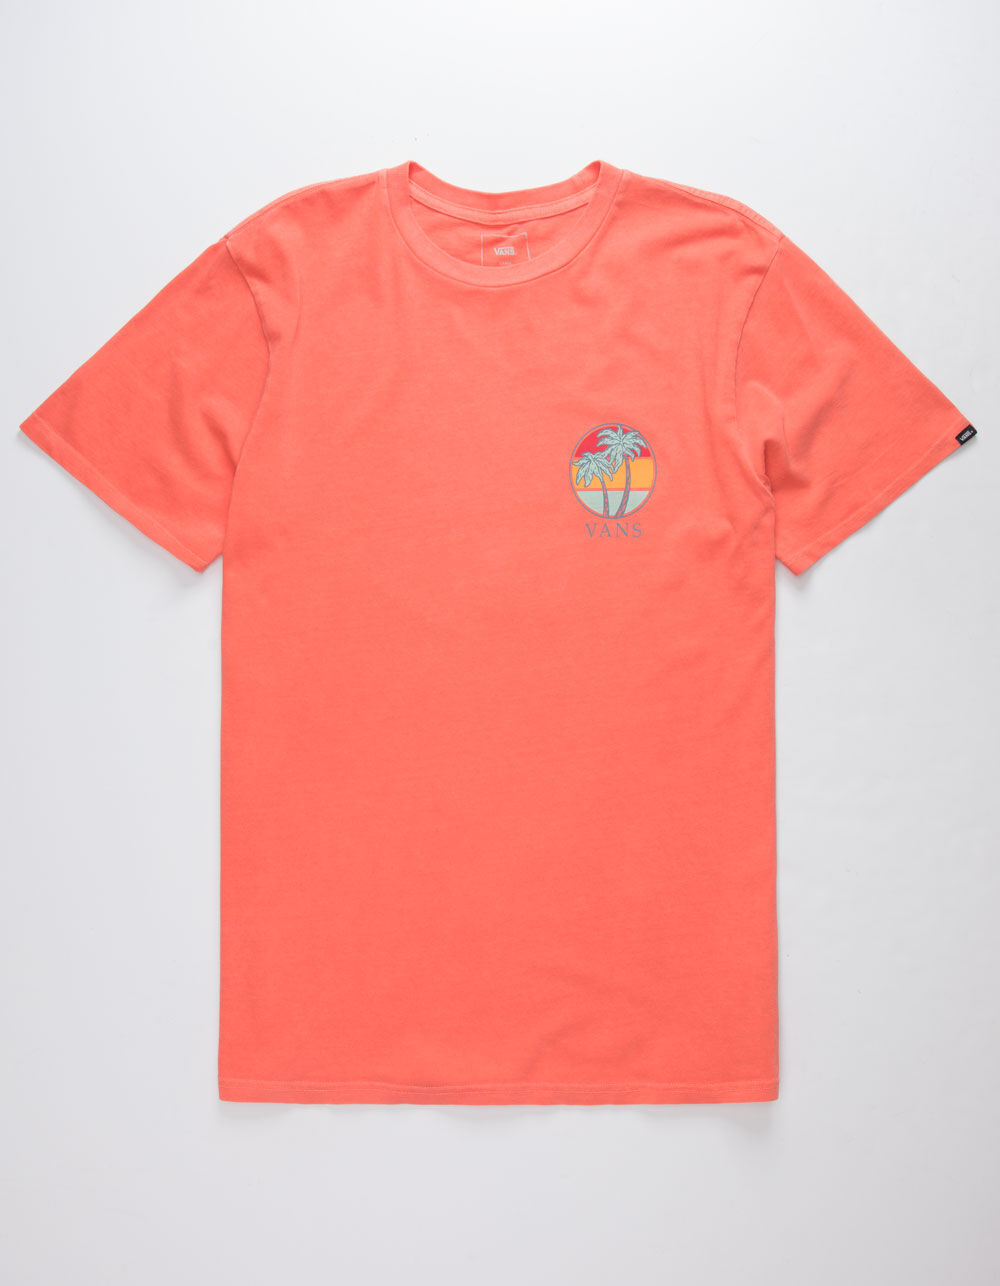 VANS Vintage Shorizon T-Shirt